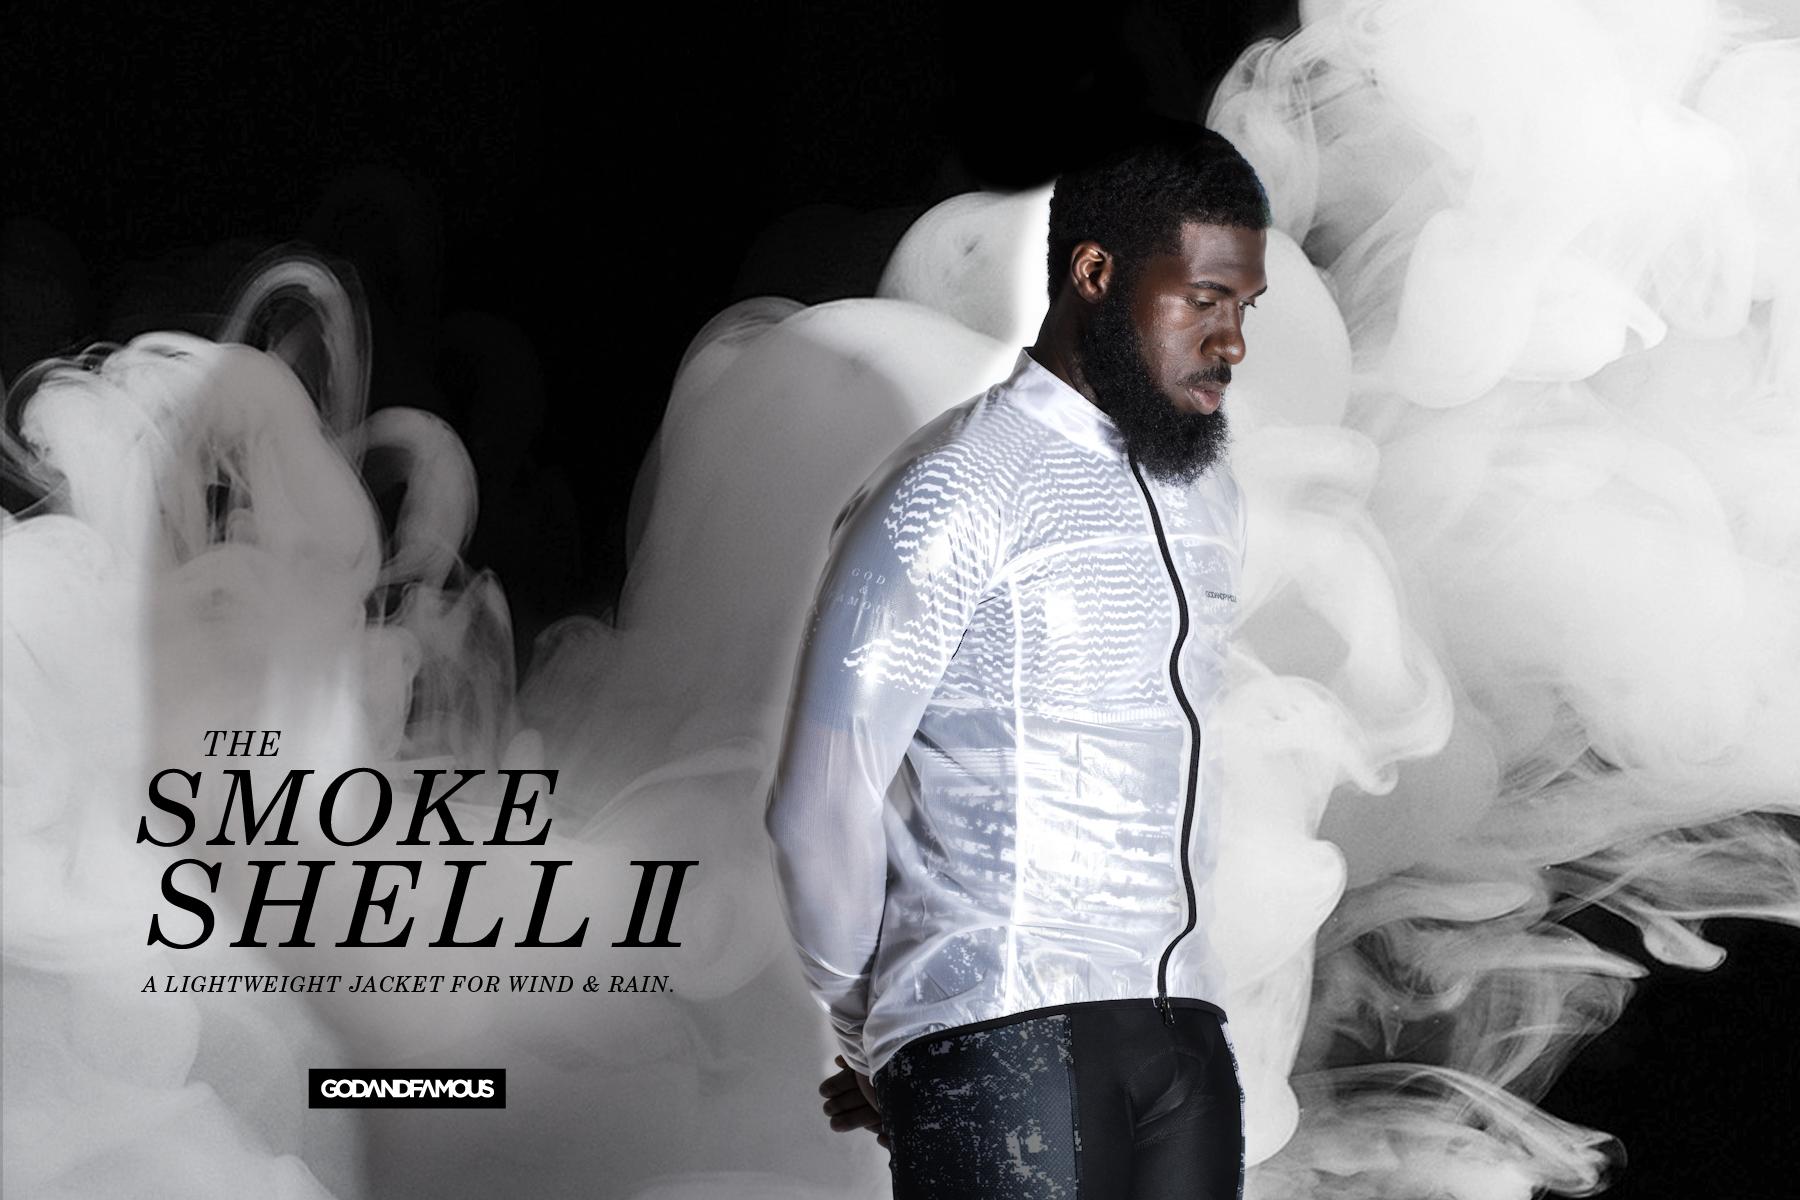 godandfamous_smokeshell2_promo_4.jpg